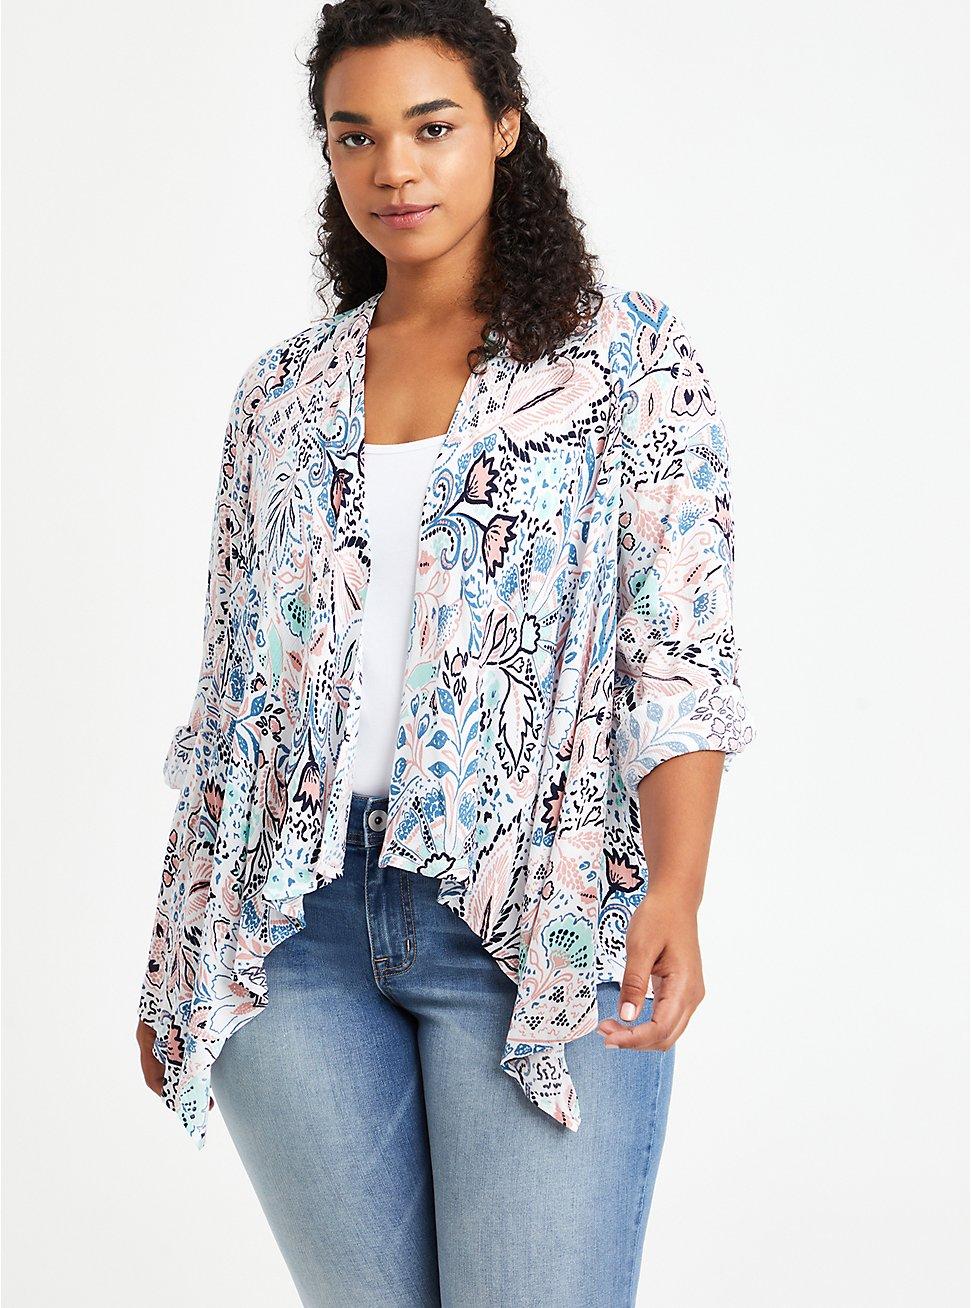 Kimono - Gauze Paisley, MULTI, hi-res